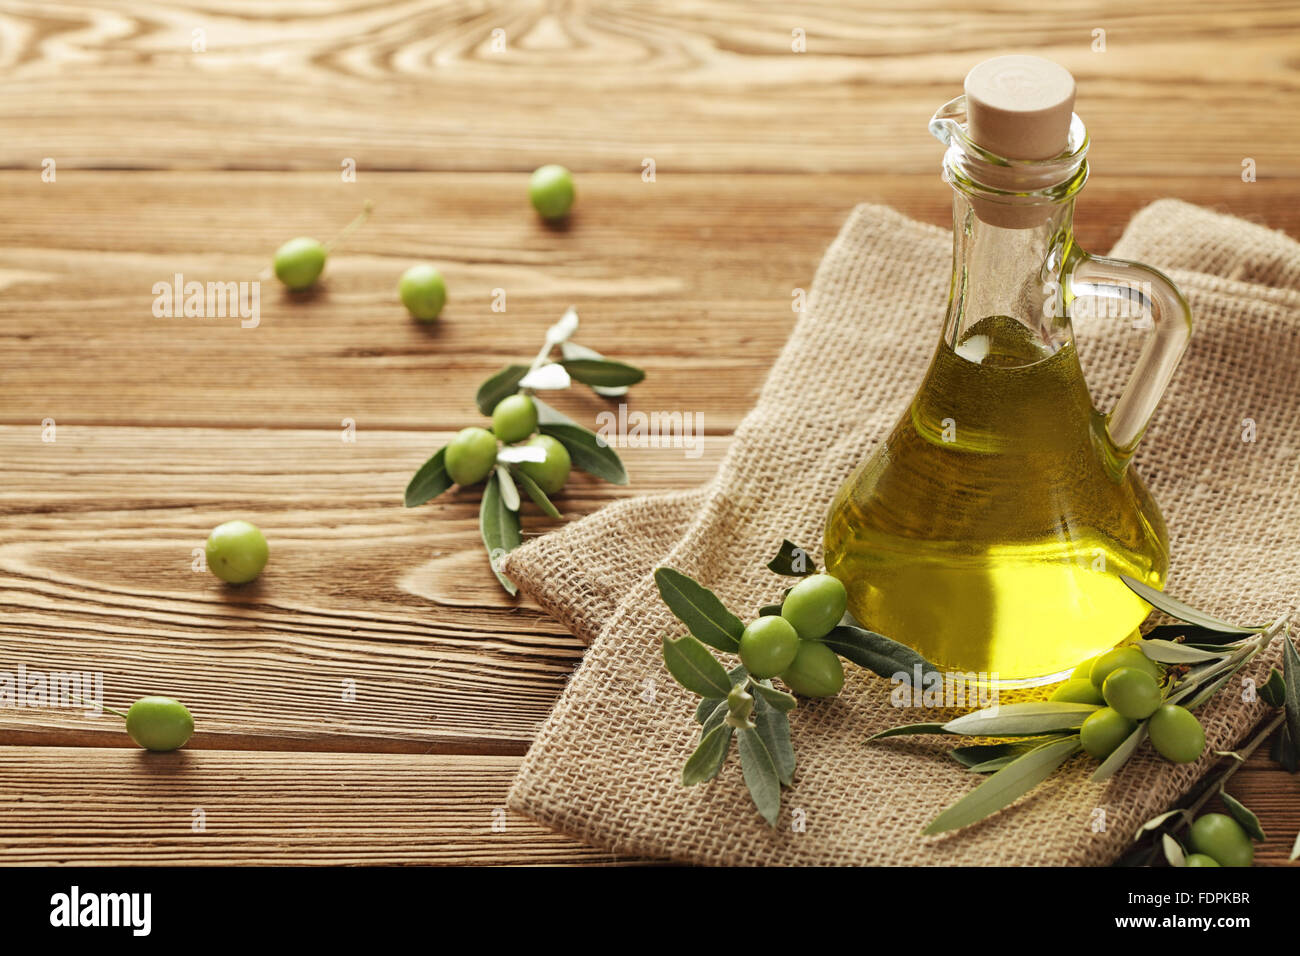 olive oil - Stock Image